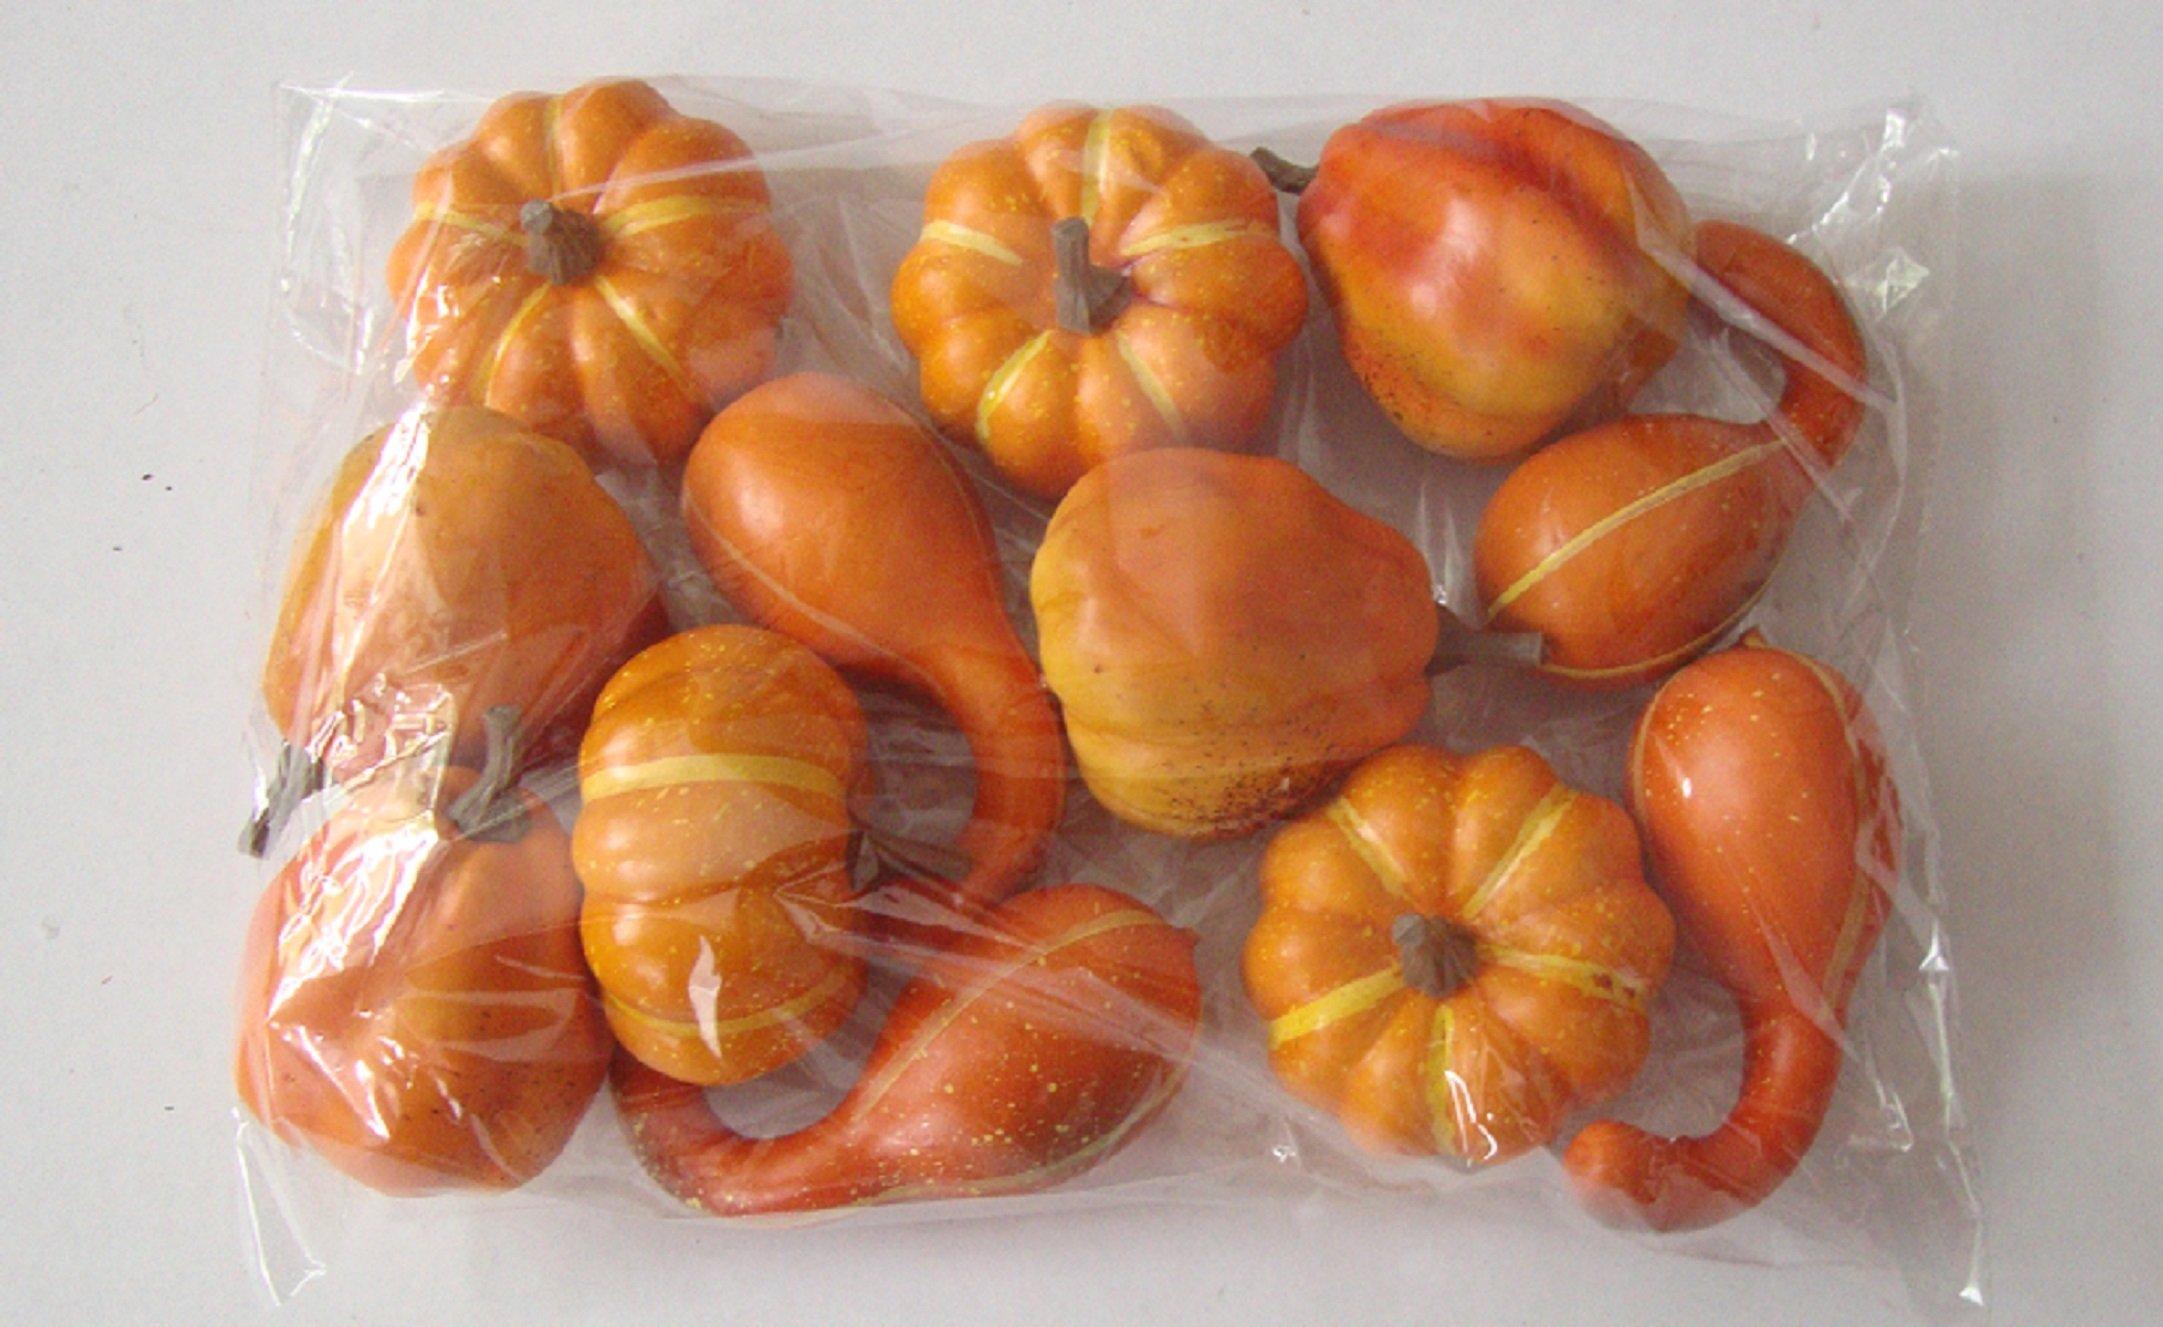 Wreaths For Door 12 Pc Set Faux Fall Gourds Pumpkins Autumn Thanksgiving Home Decor Vase Bowl Filler